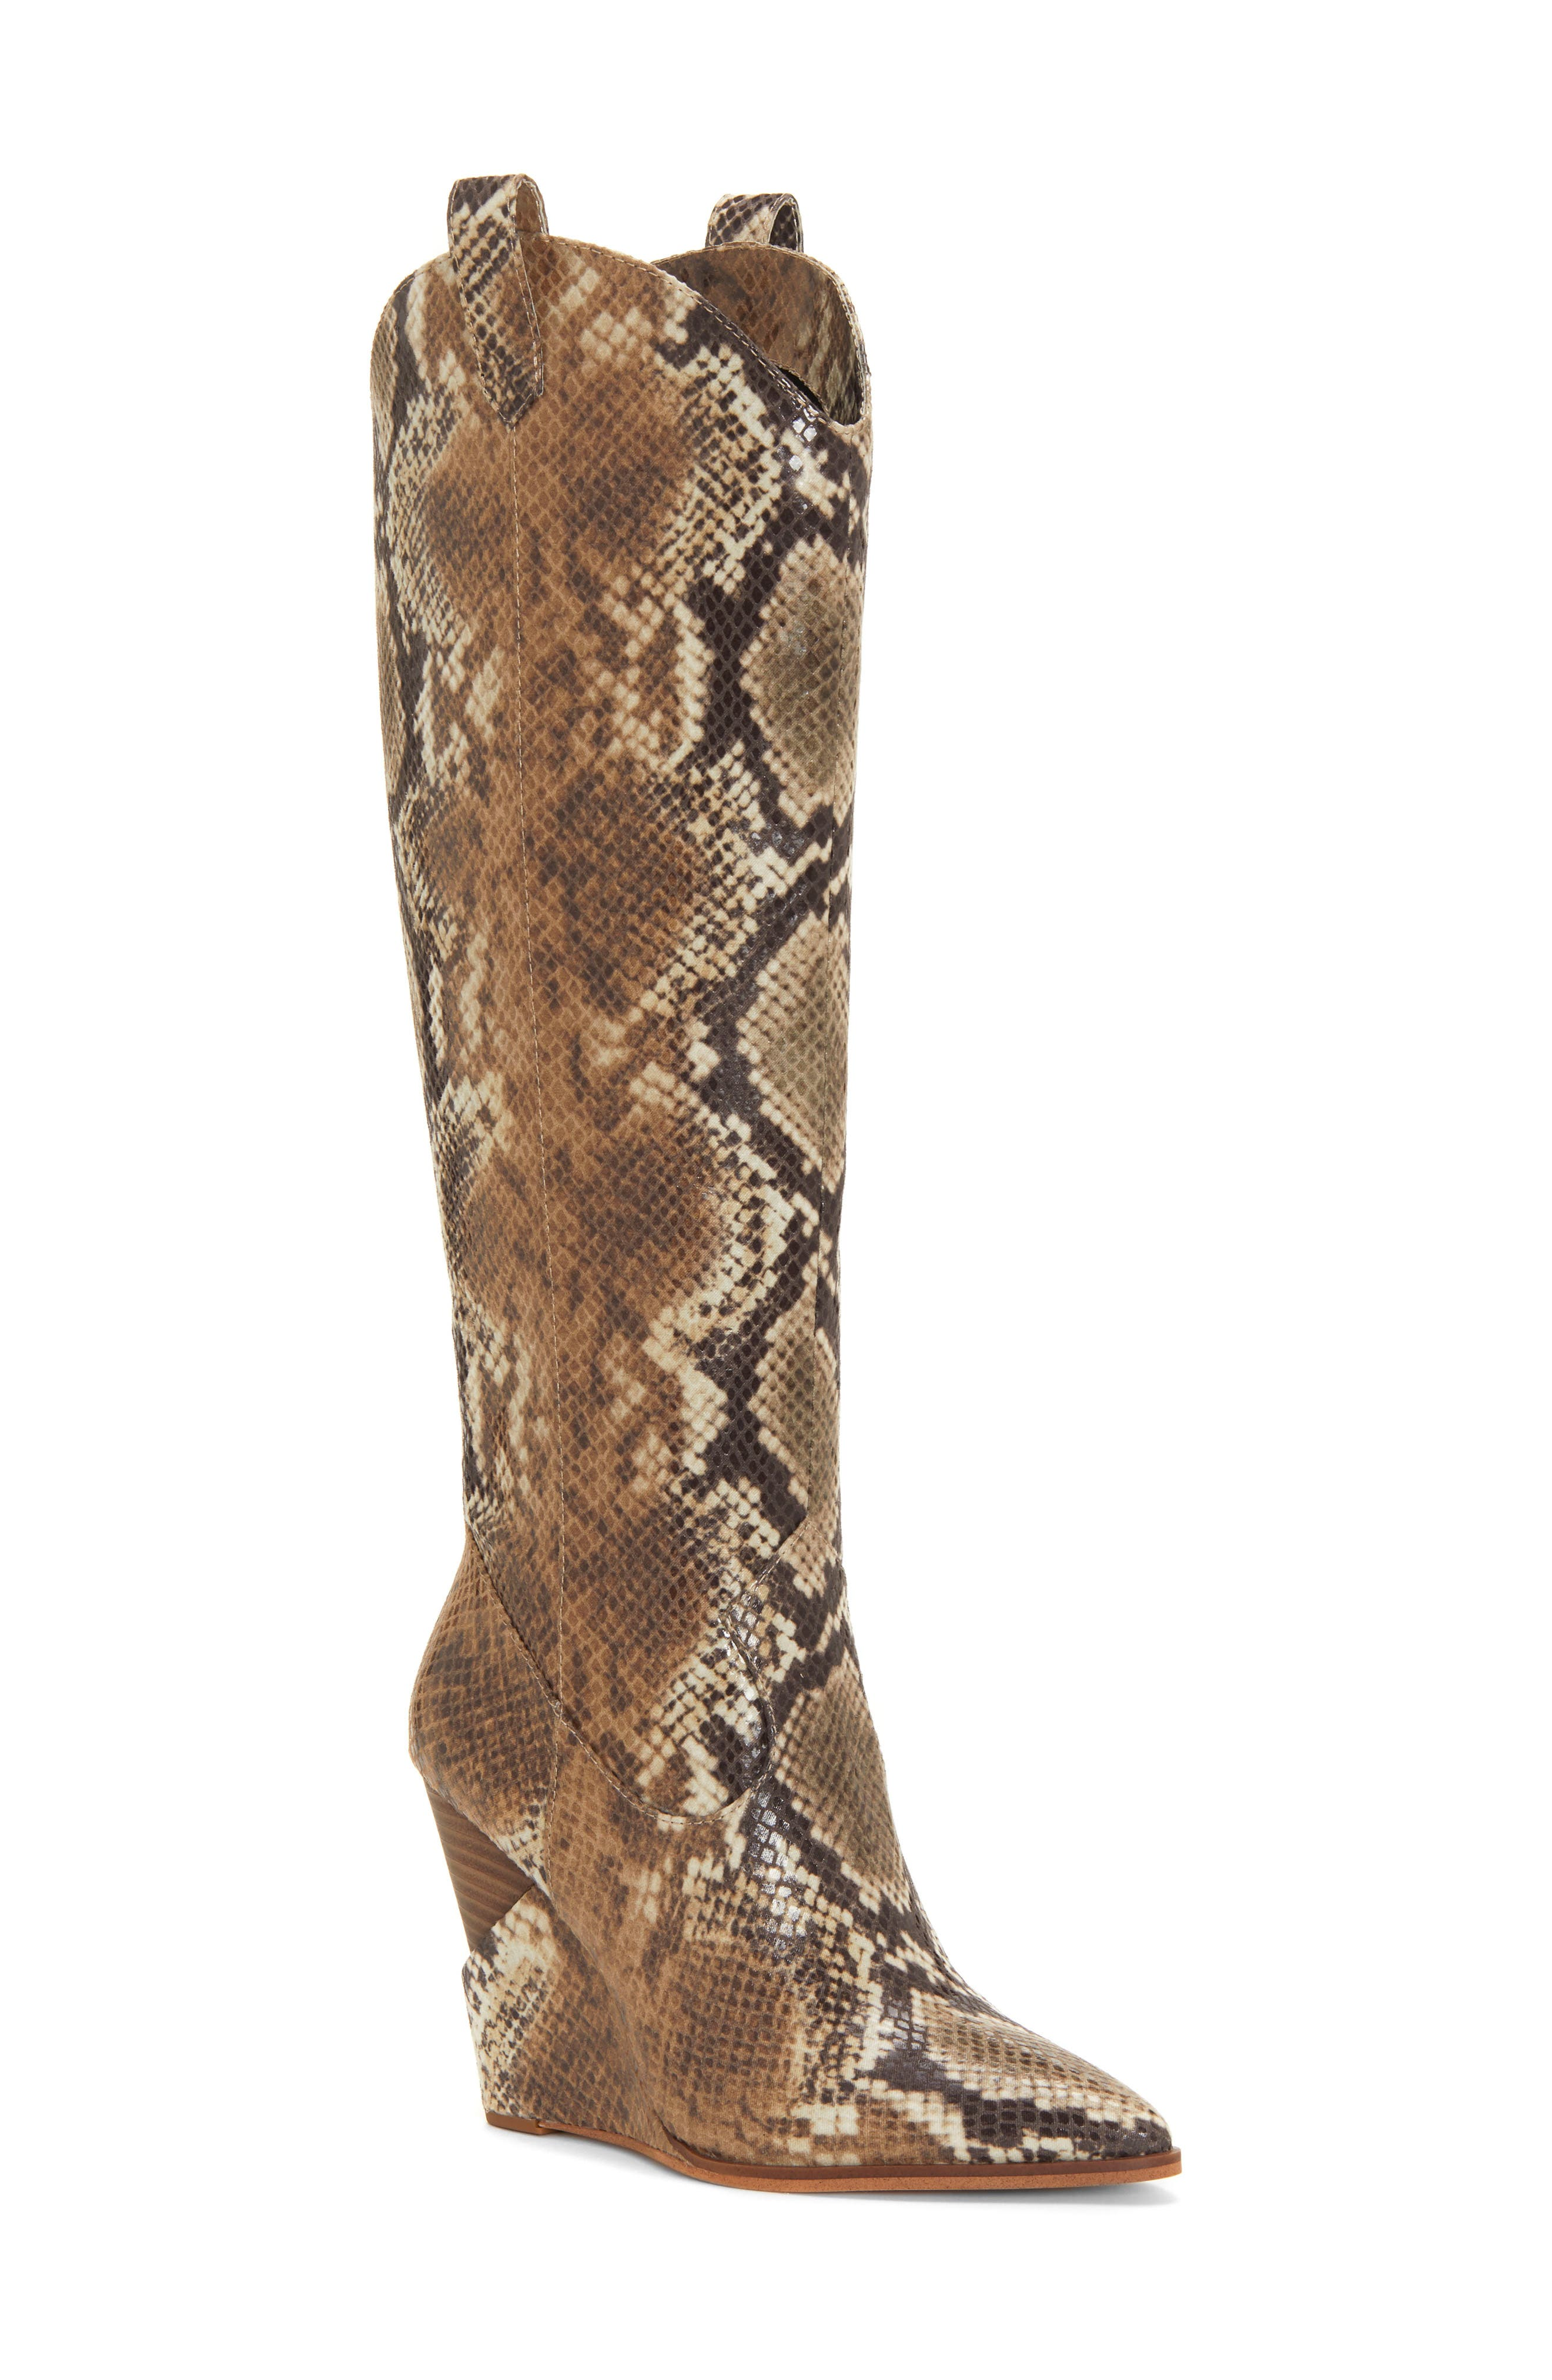 Jessica Simpson Havrie Knee High Boot, Beige